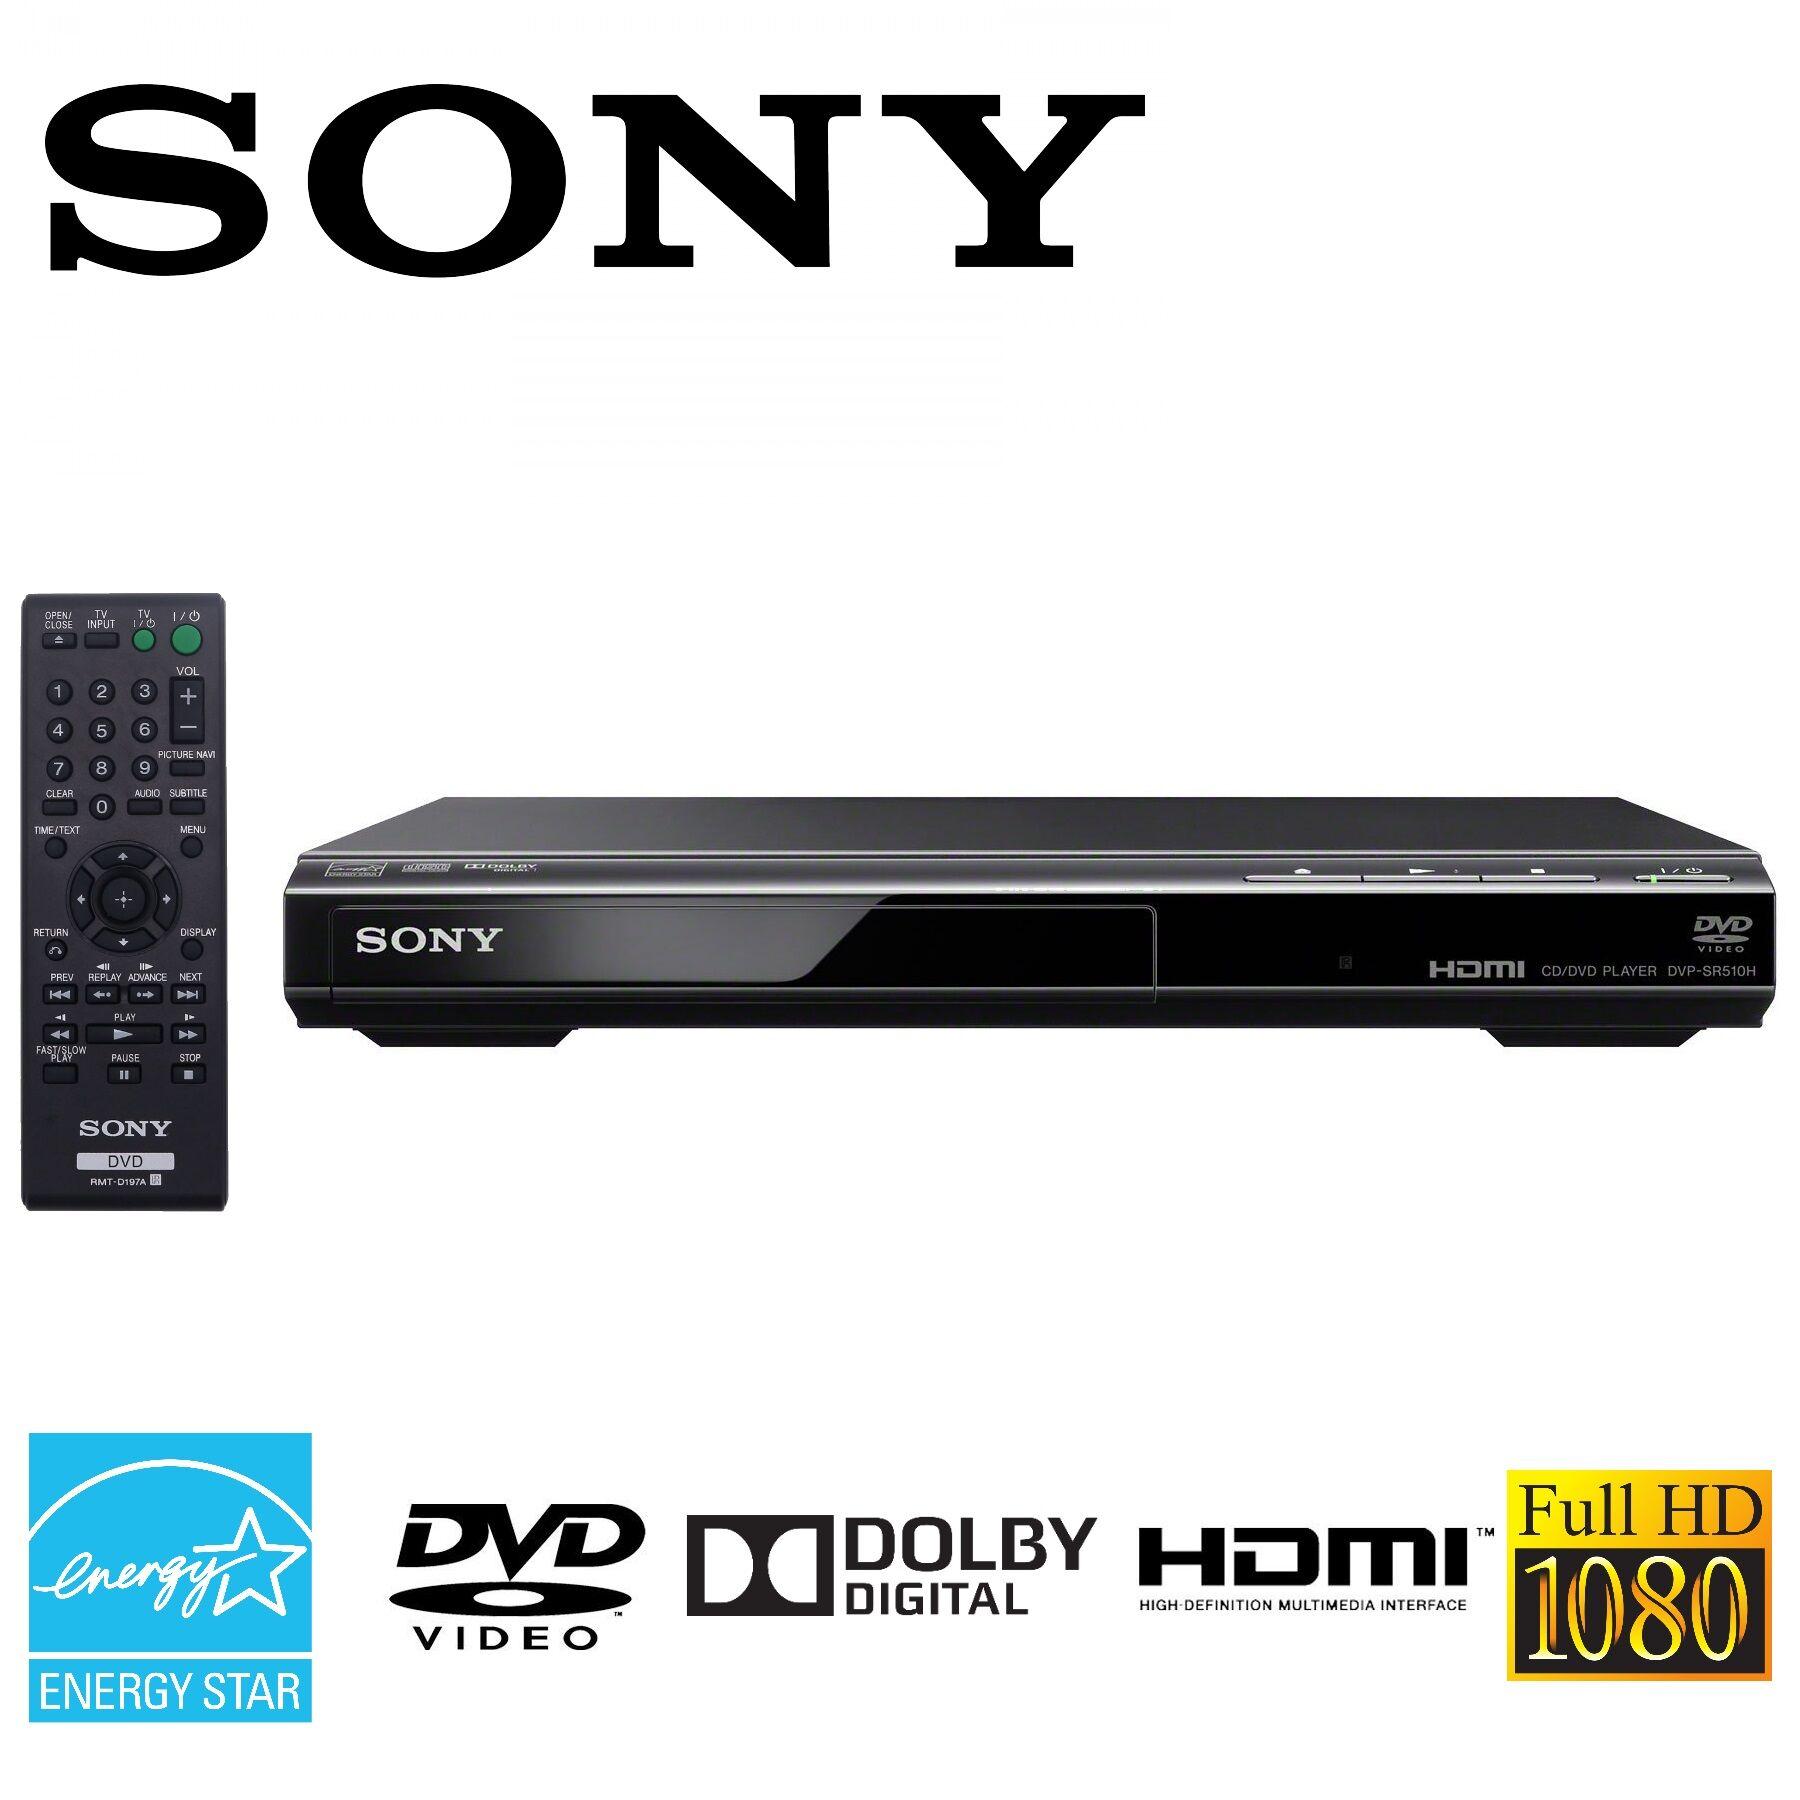 Sony DVPSR510H - DVD Player Ultra Slim 1080p Upscaling